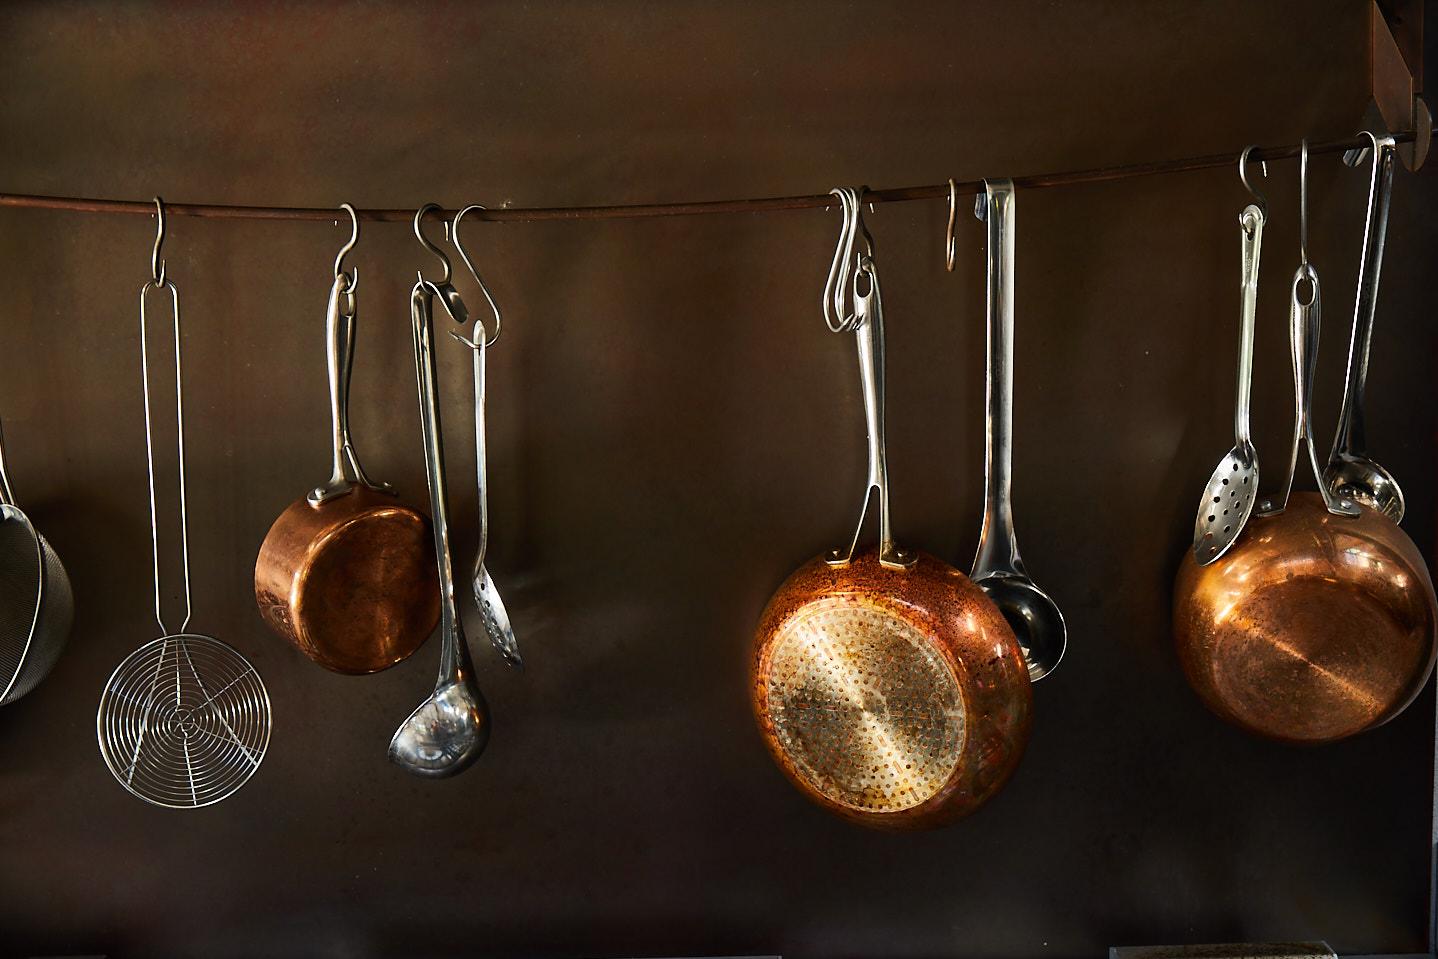 Cornwall kitchen pans